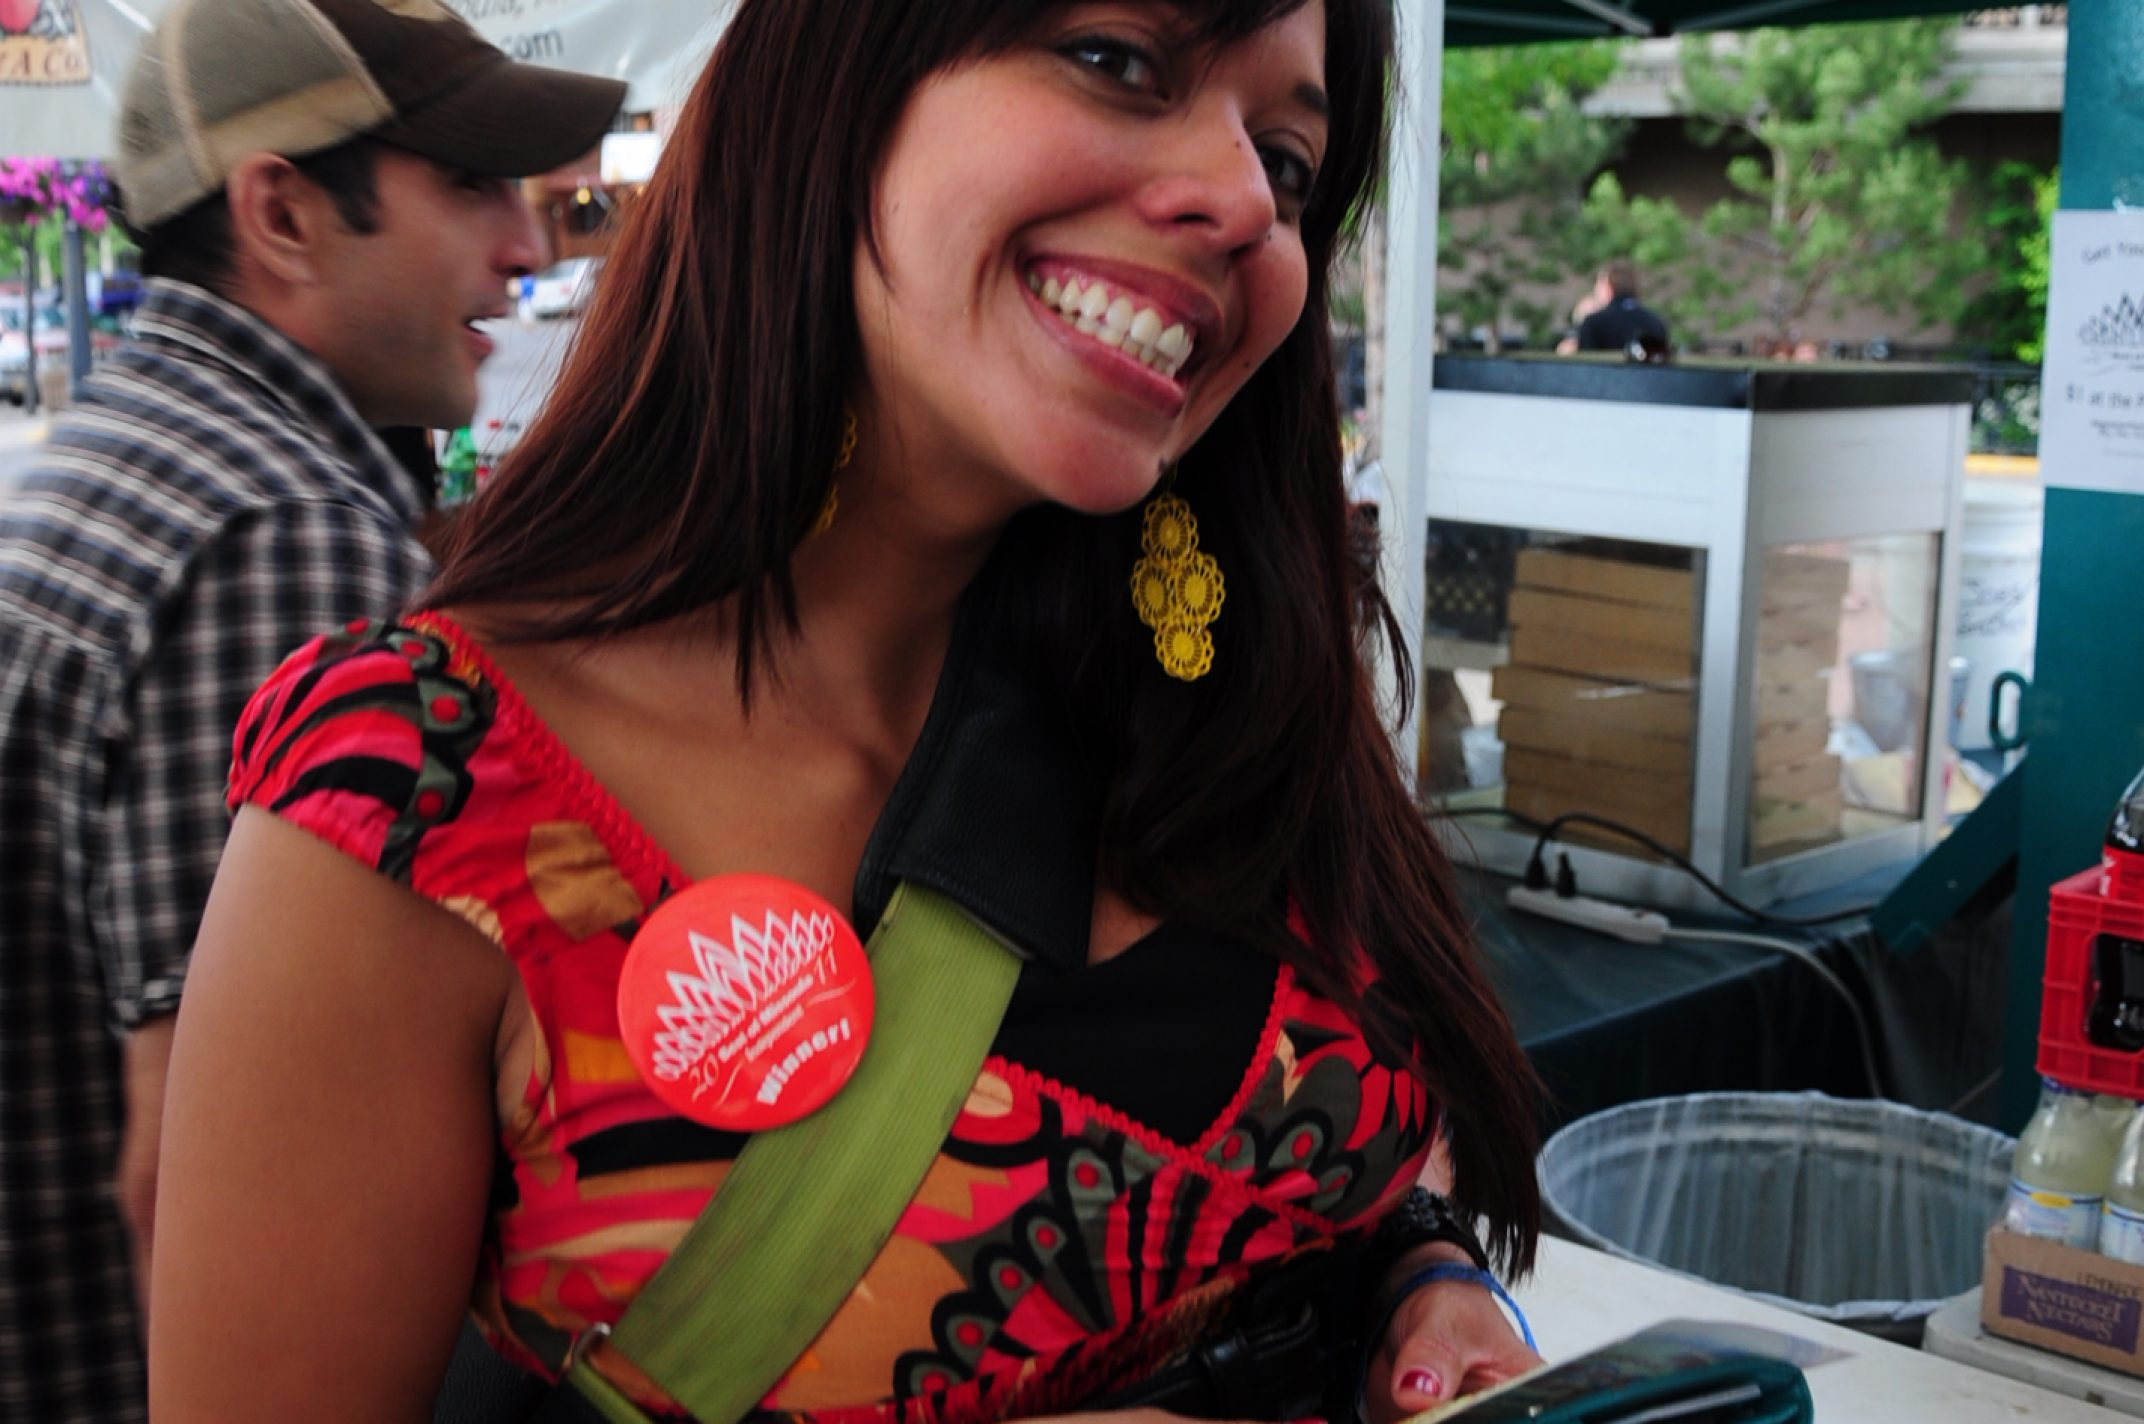 Best of Missoula Party, 2011